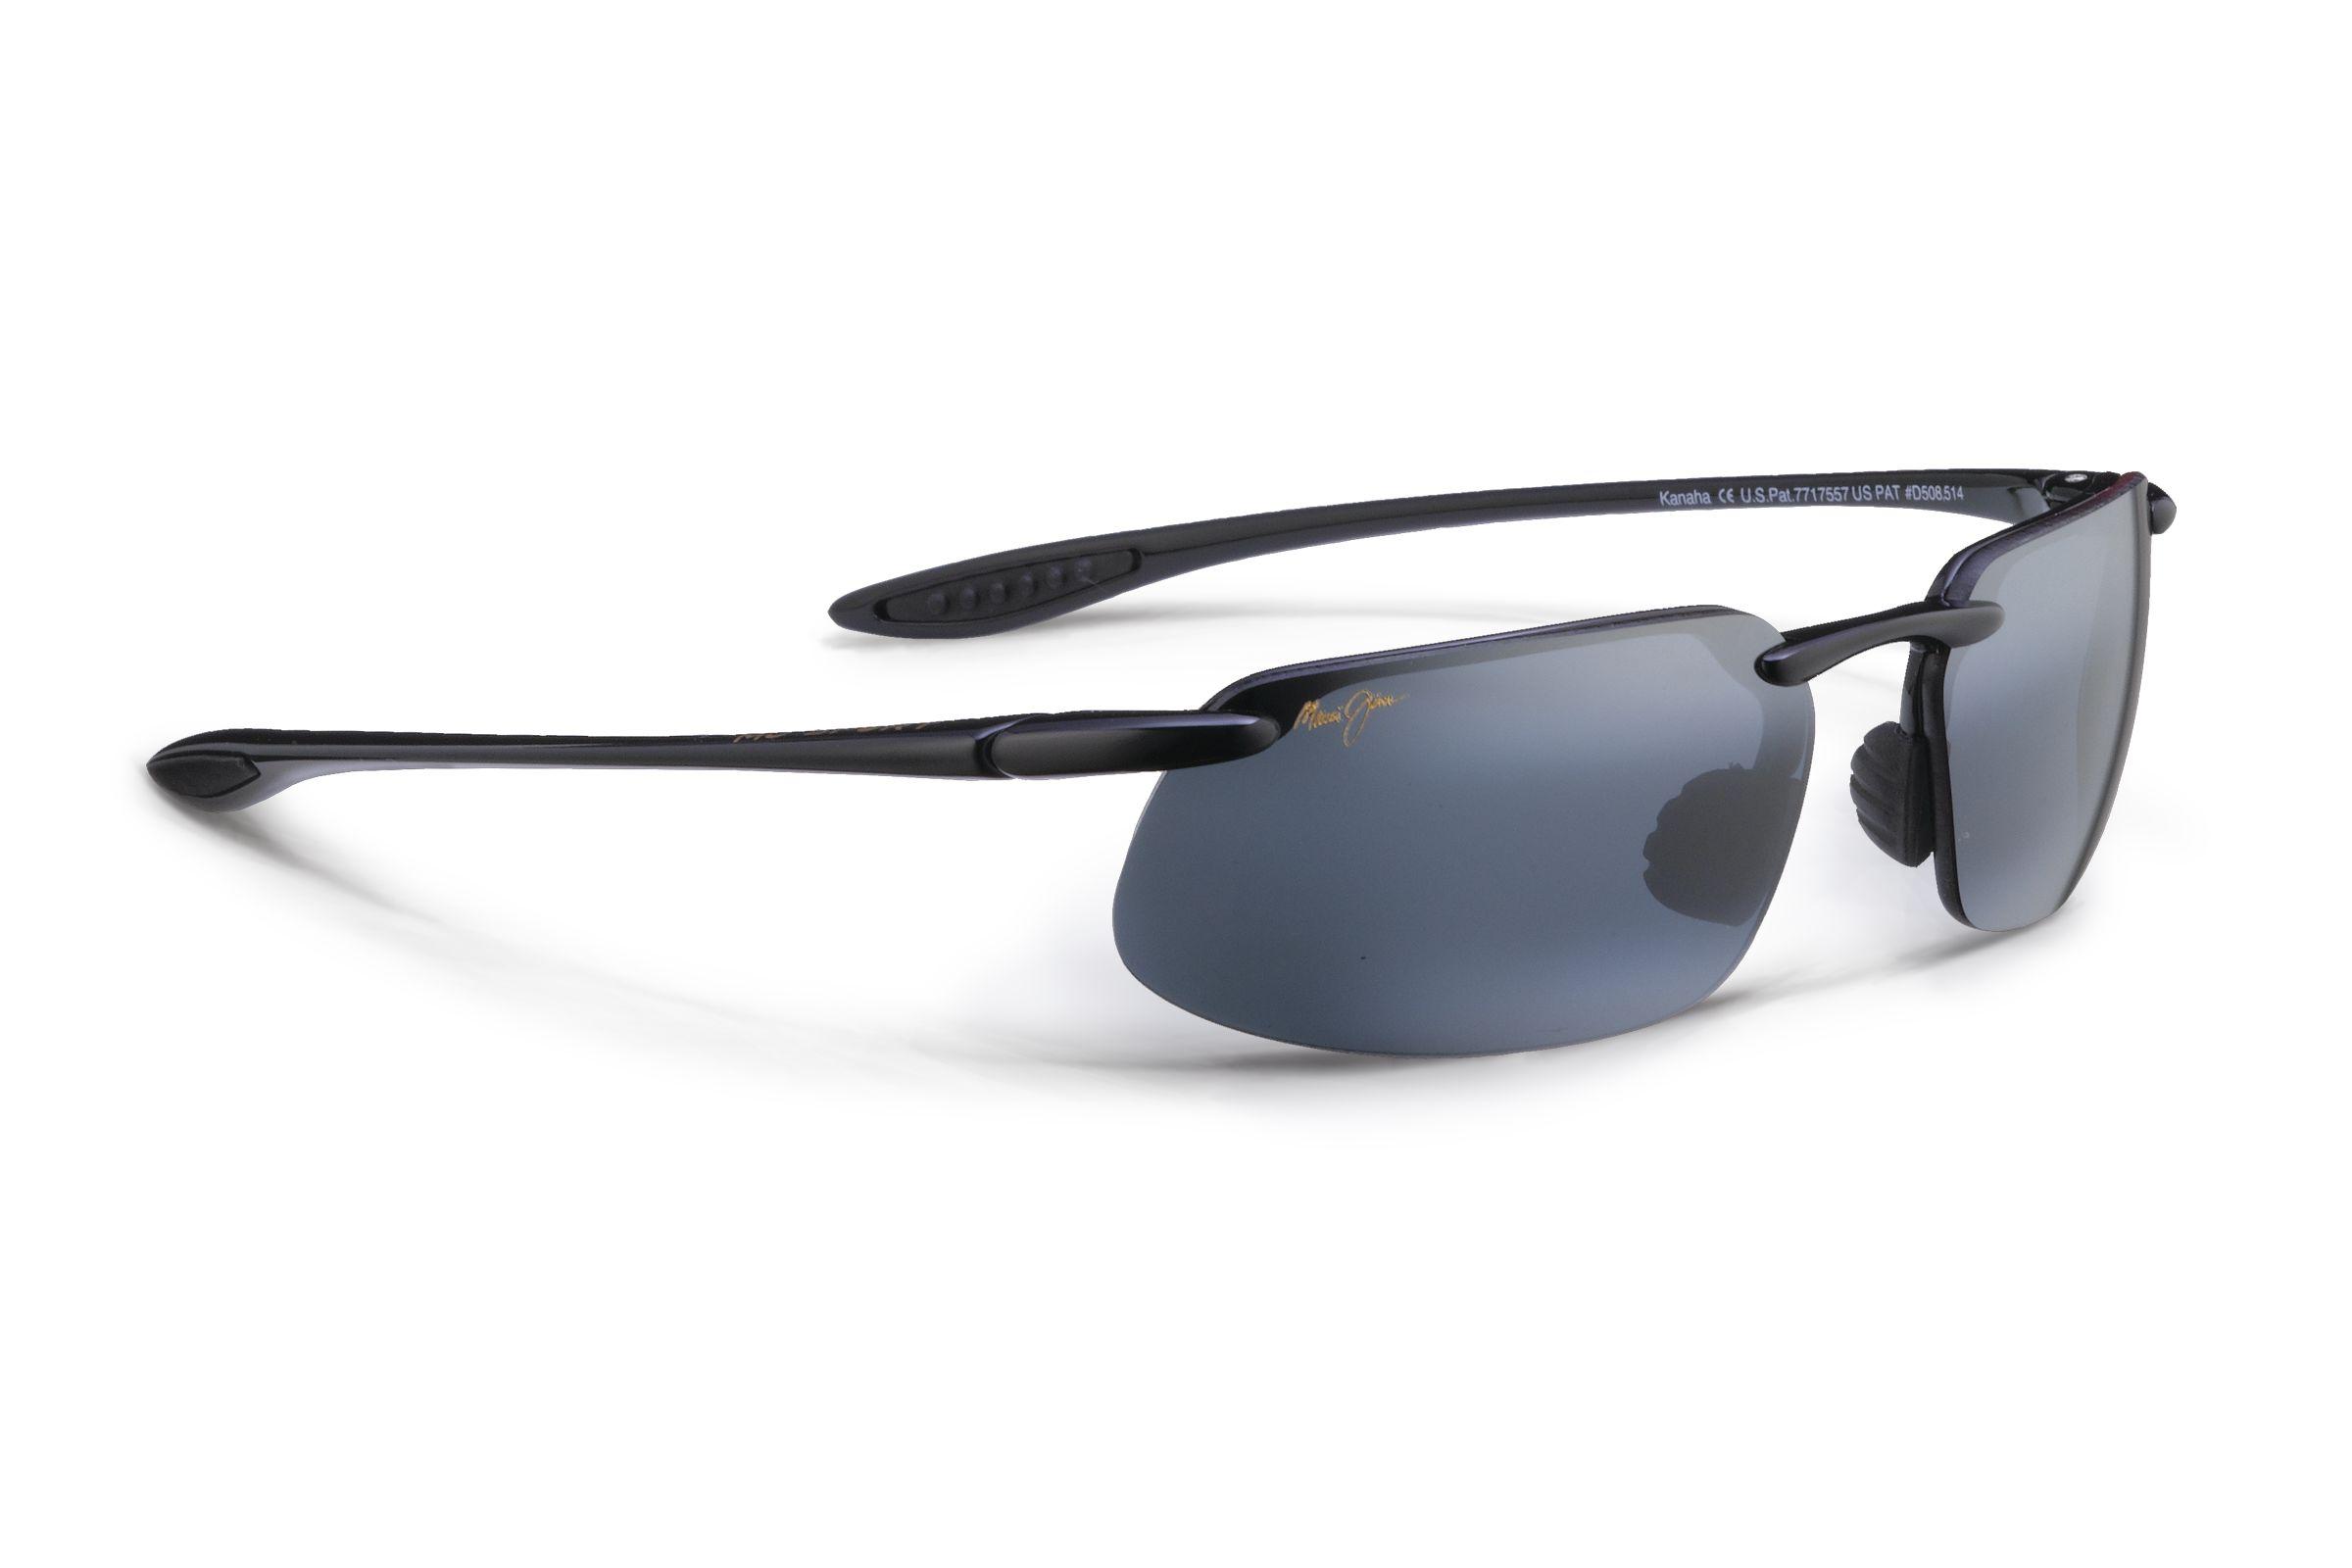 Universal Fit Neutral Grey Lenses with Patented PolarizedPlus2 Lens Technology 2 G807N-0220 Maui Jim Hookipa Reader Polarized Gloss Black Rimless Frame Sunglasses